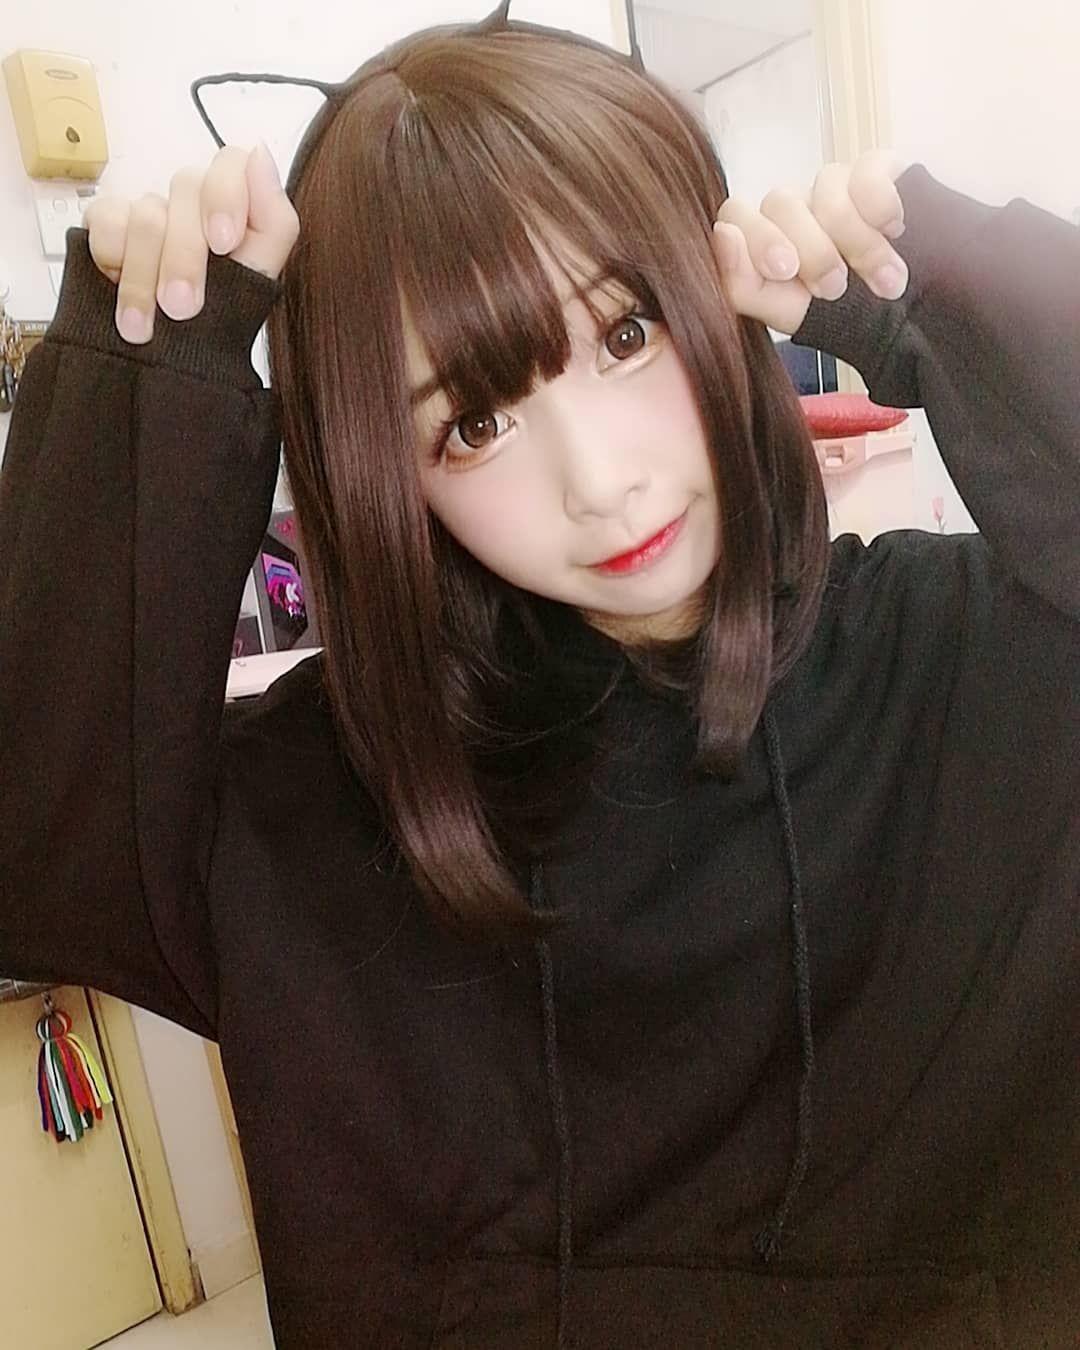 "CN :EBI 刘虾米 on Instagram: ""Menhera chan ♥♥♥♥(●′ω`●)"""